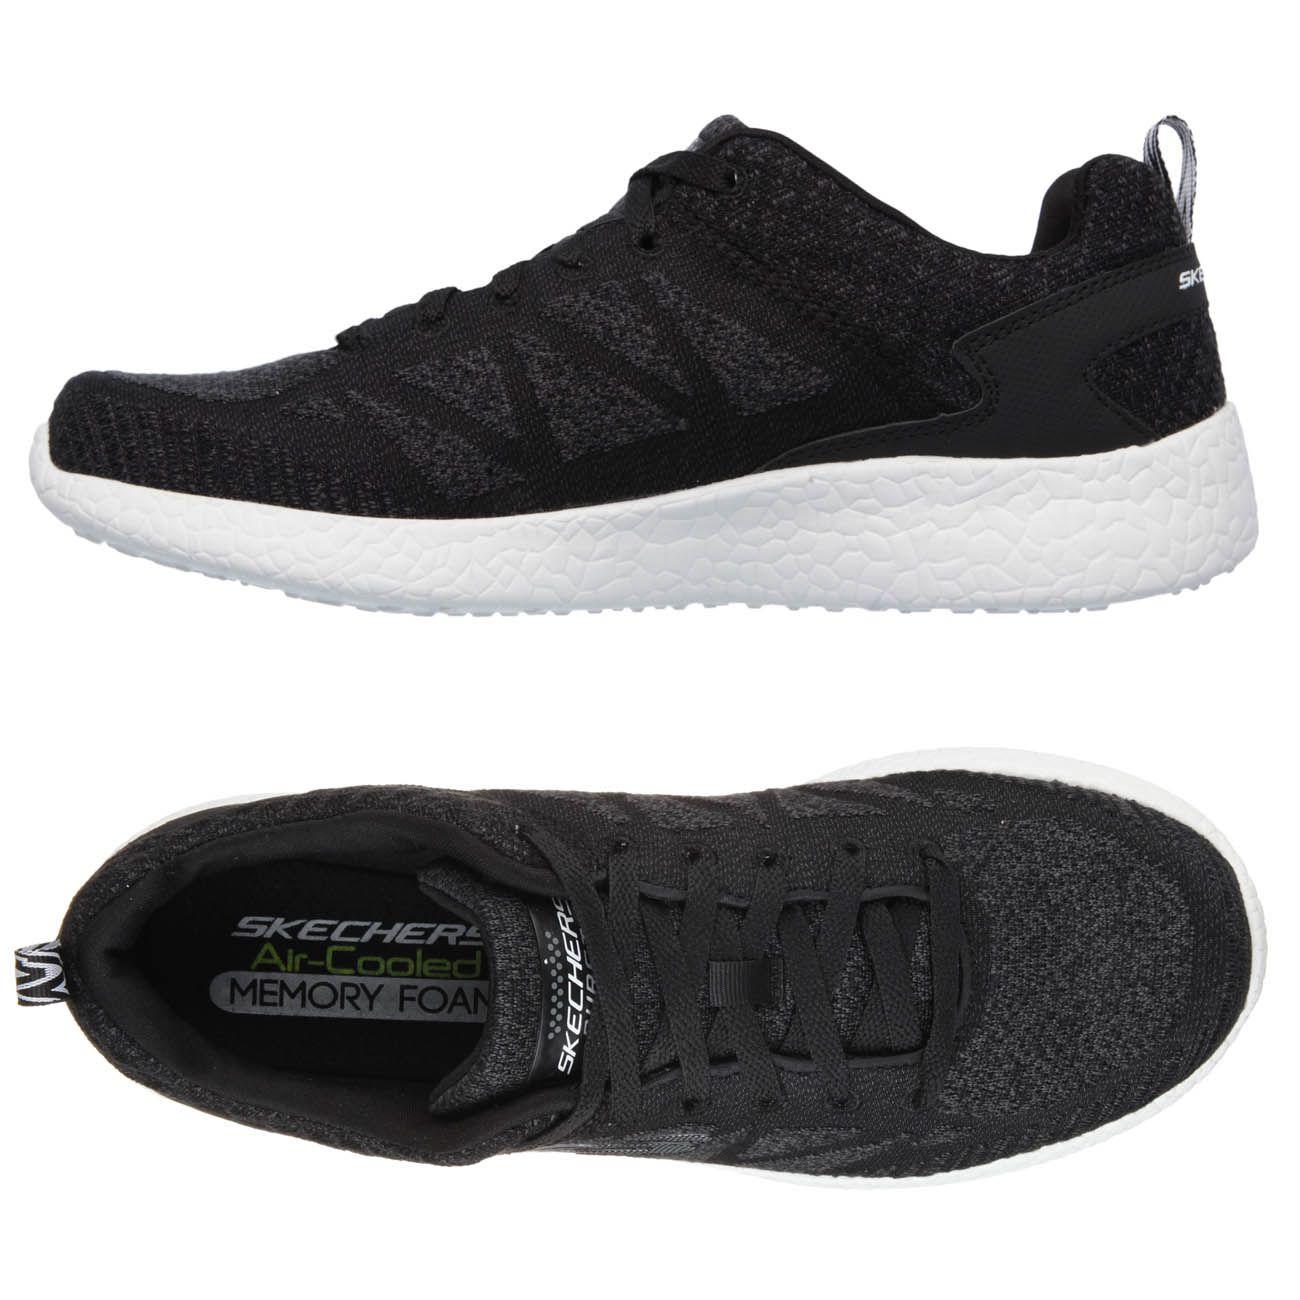 Skechers Burst Deal Closer Mens Athletic Shoes